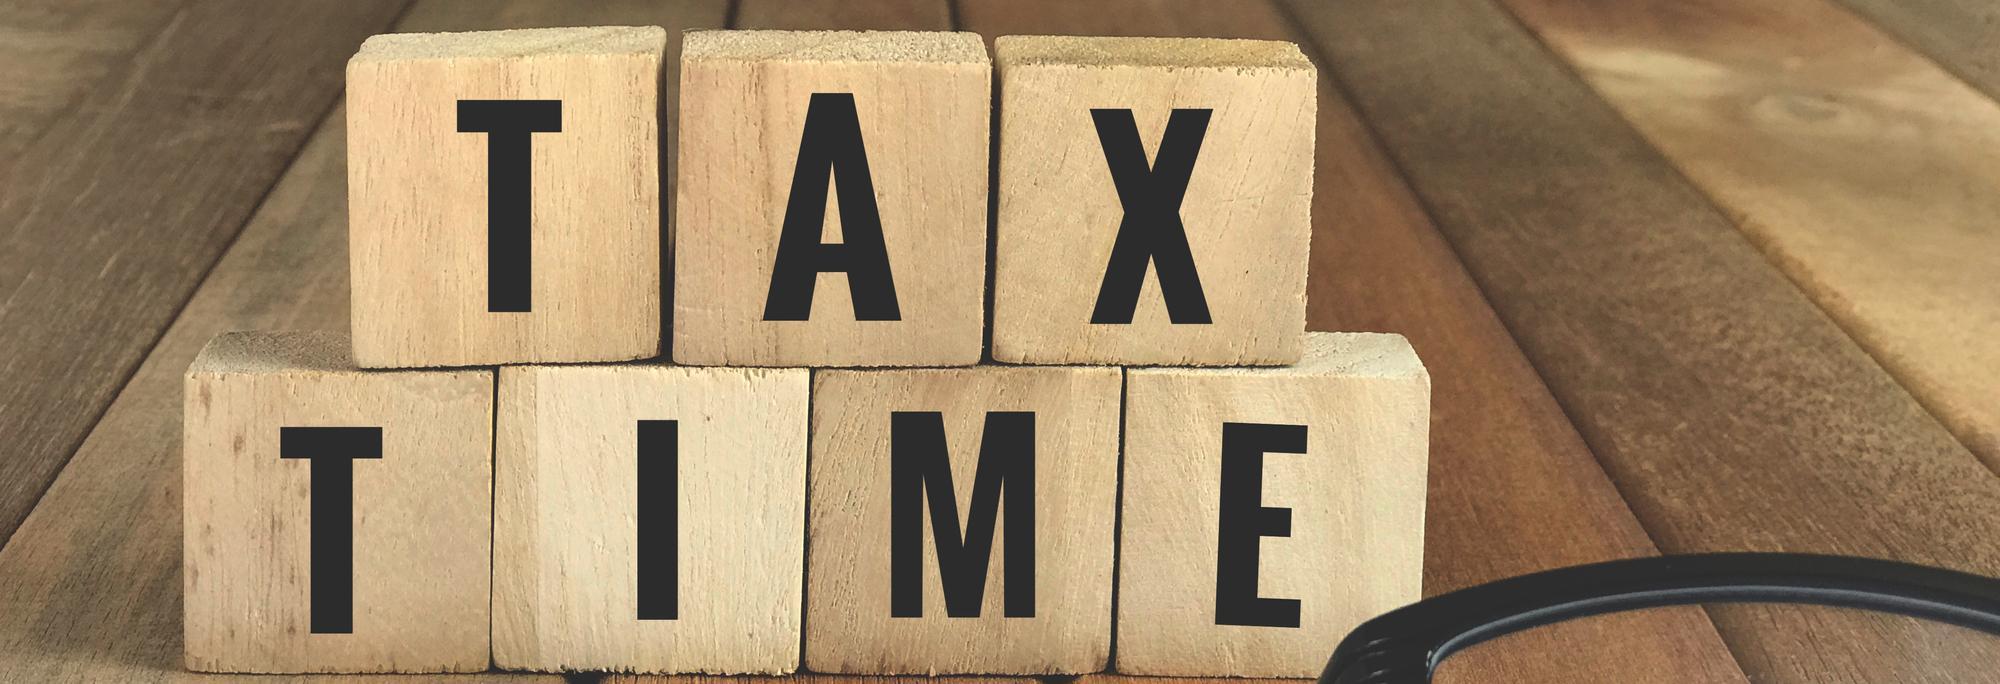 comprehensive business solutions tax preparation cincinnati ohio